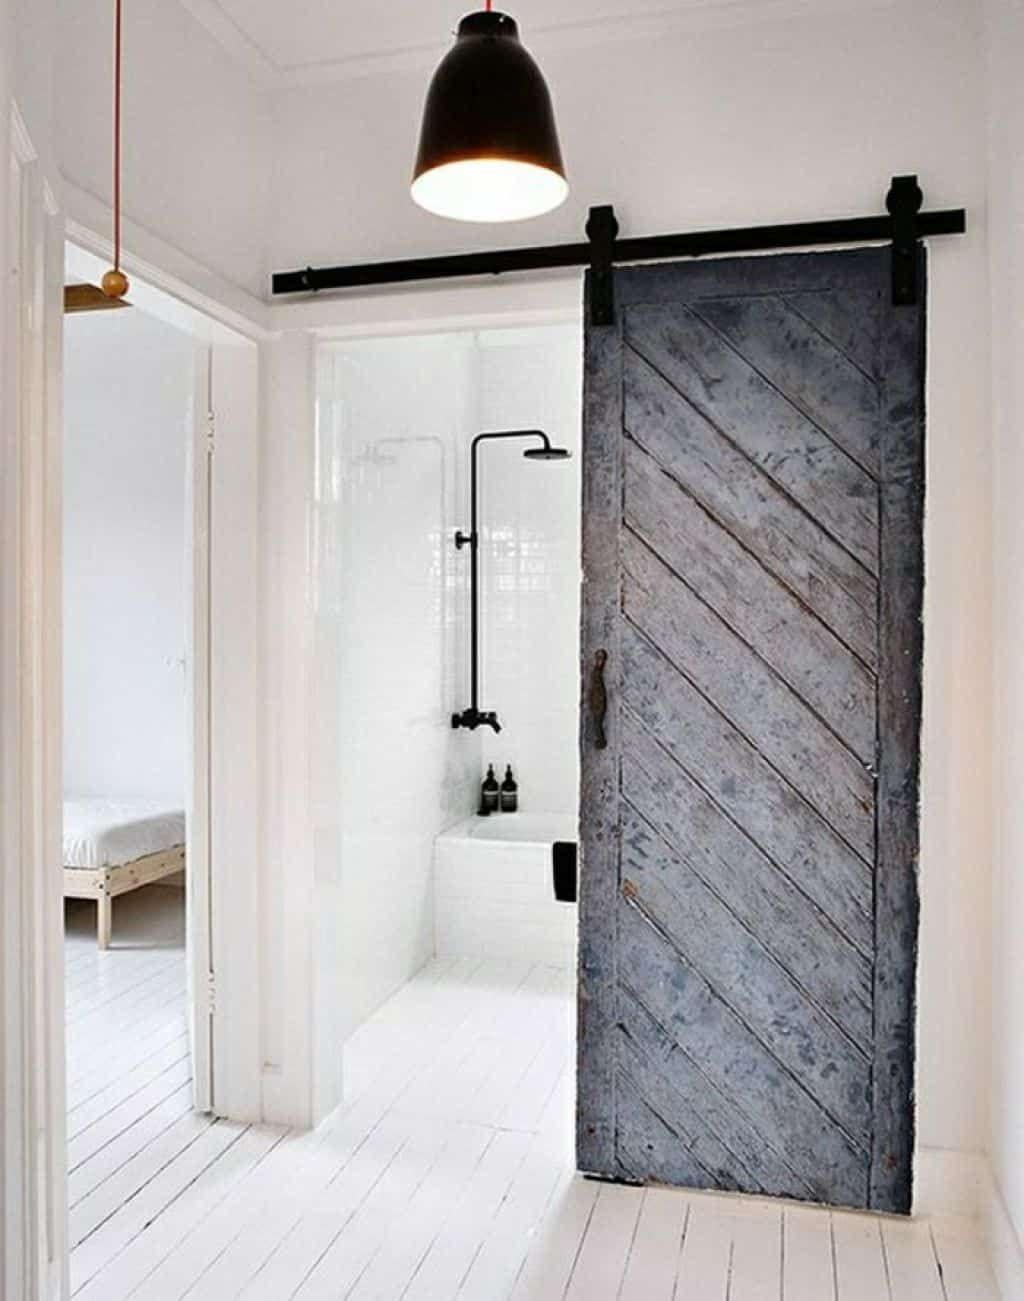 Different Types Of Bathroom Doors With Images Minimalism Interior Old Barn Doors Interior Barn Doors